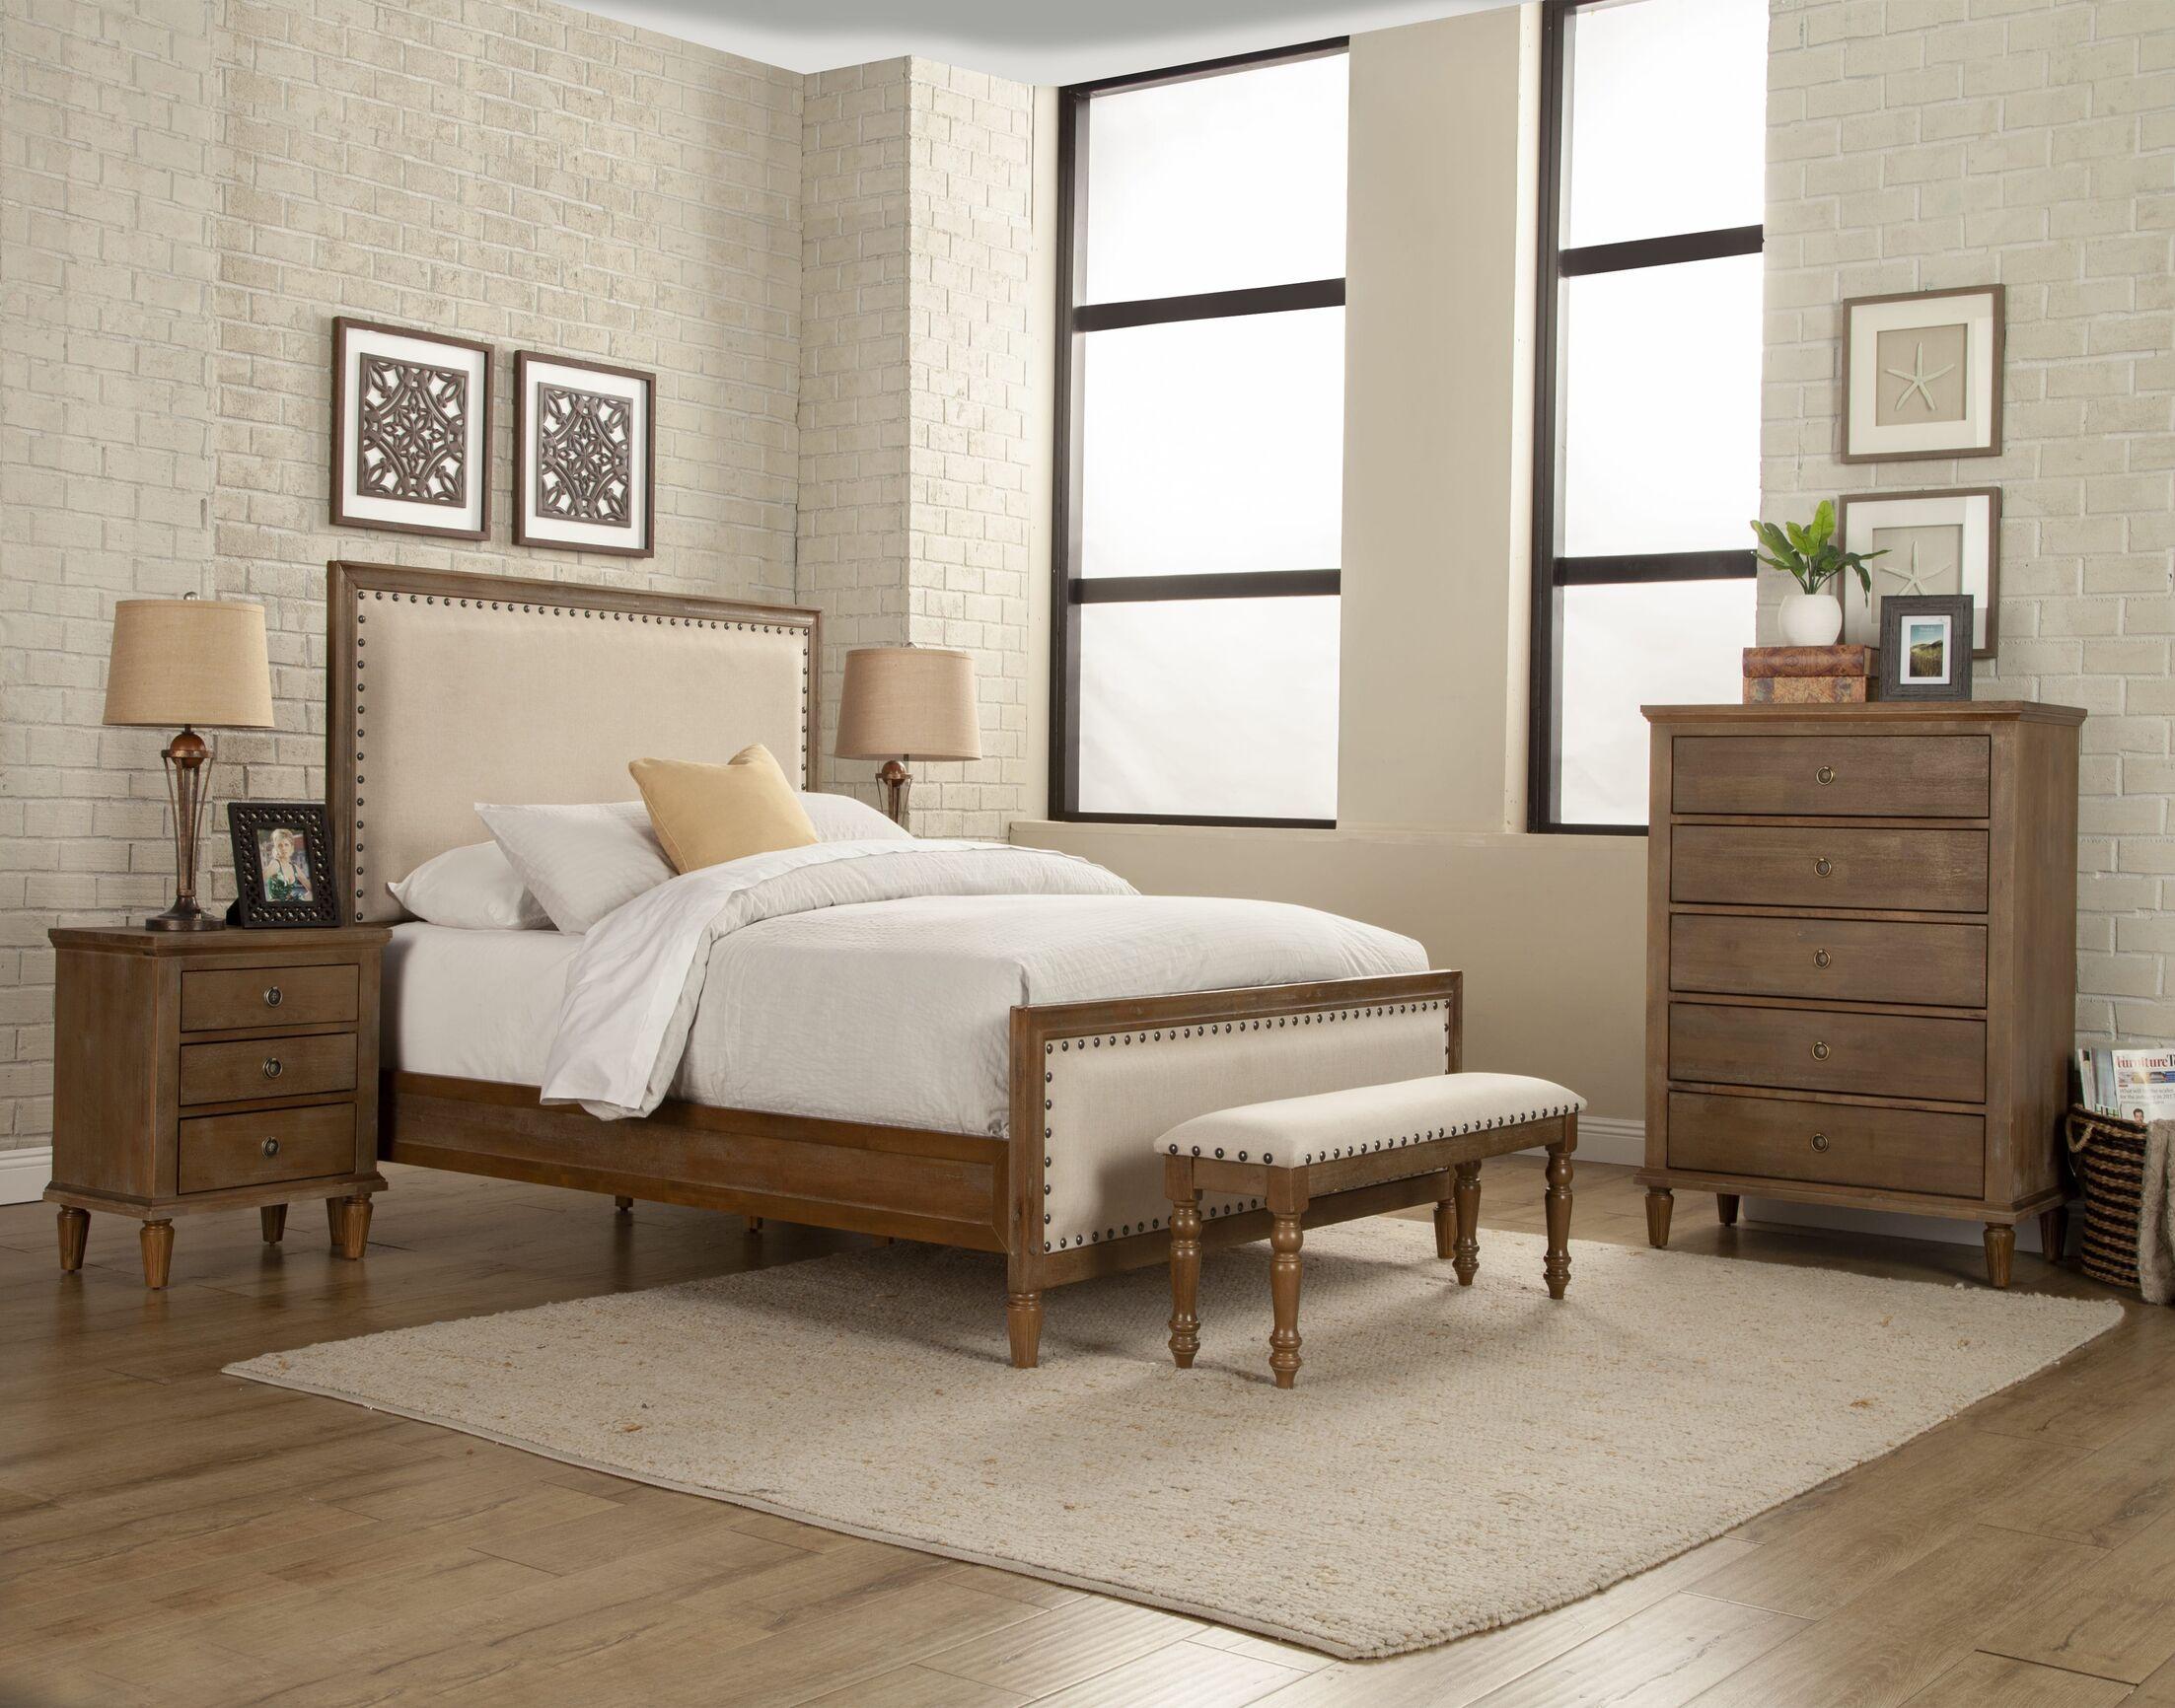 Shirke Panel 5 Piece Bedroom Set Color: Brown, Bed Size: King